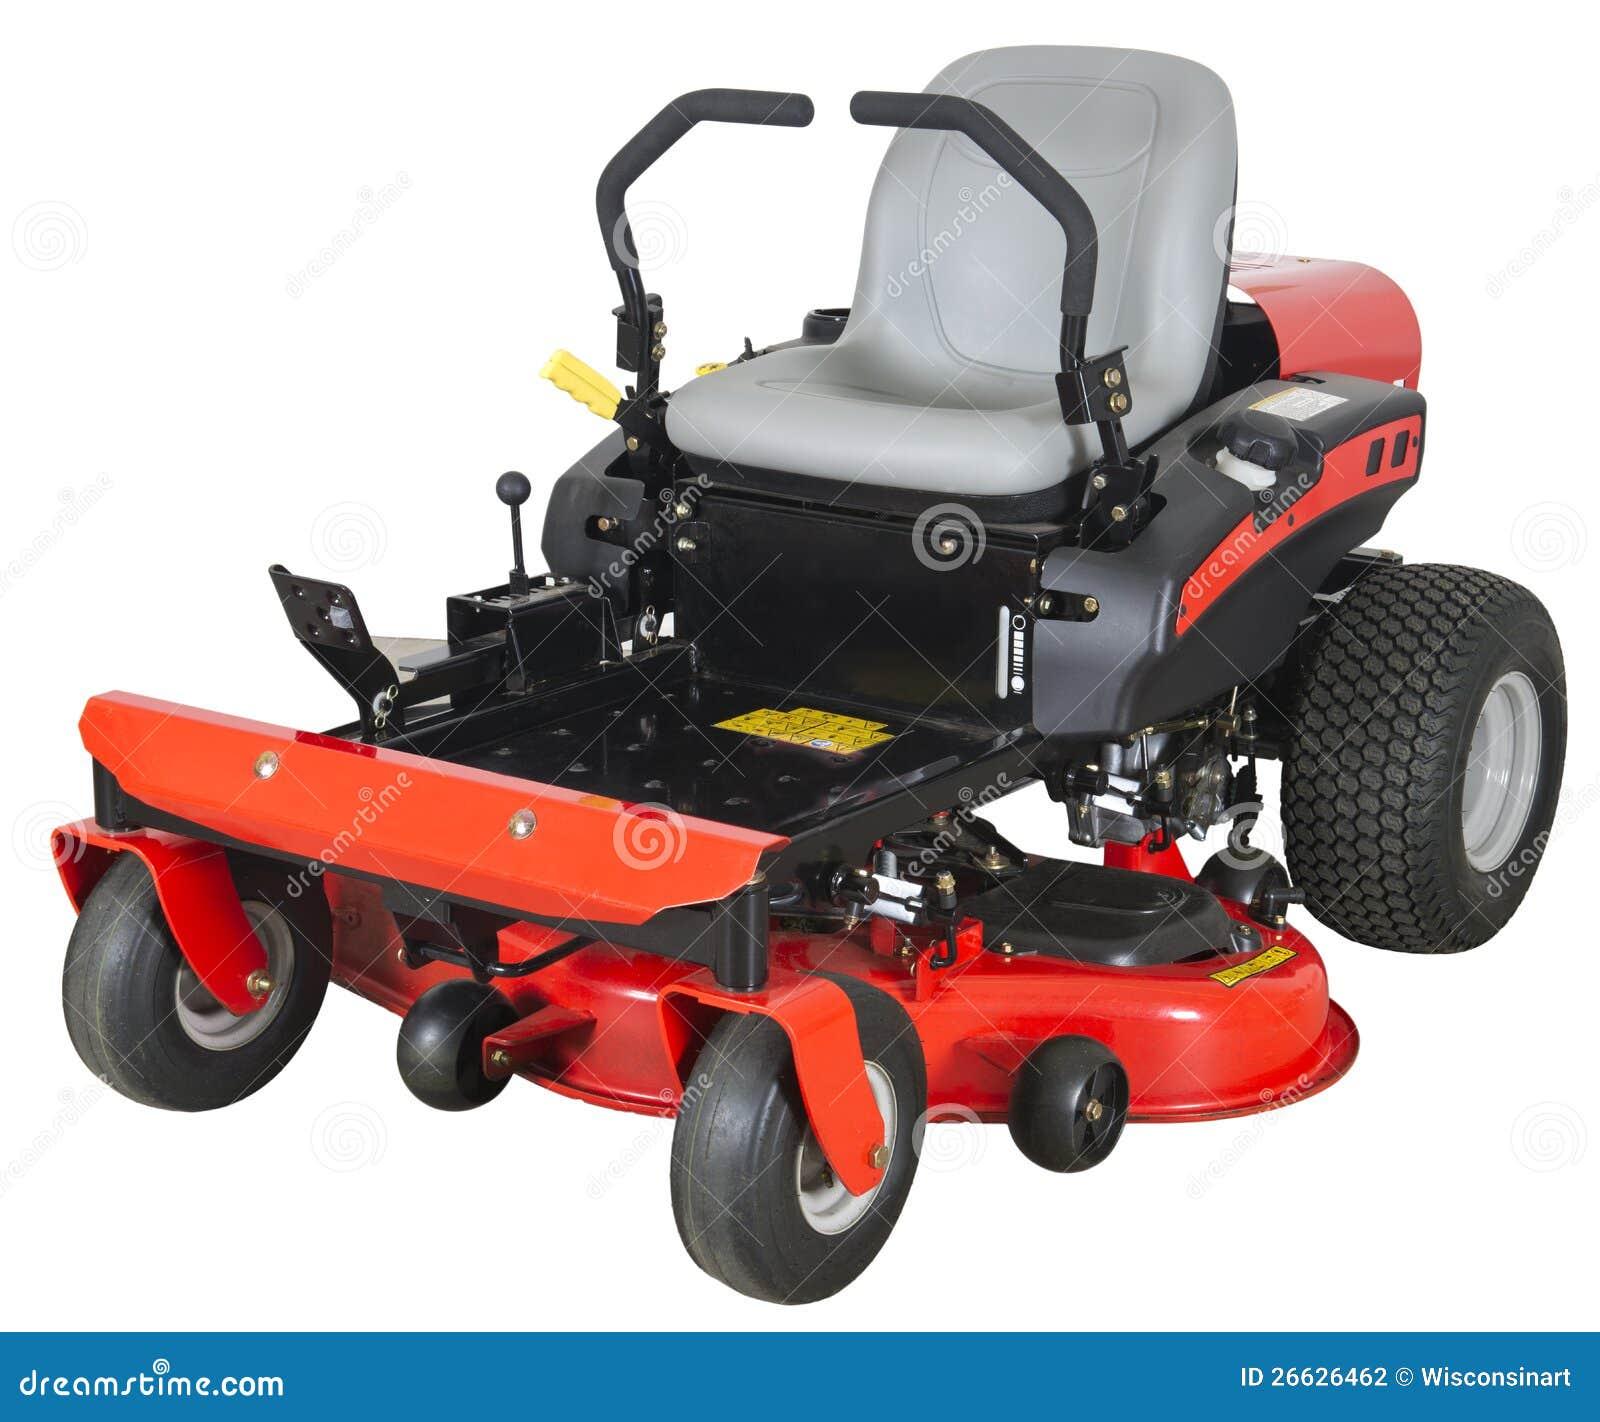 white lawn mower belt diagram  white  free engine image